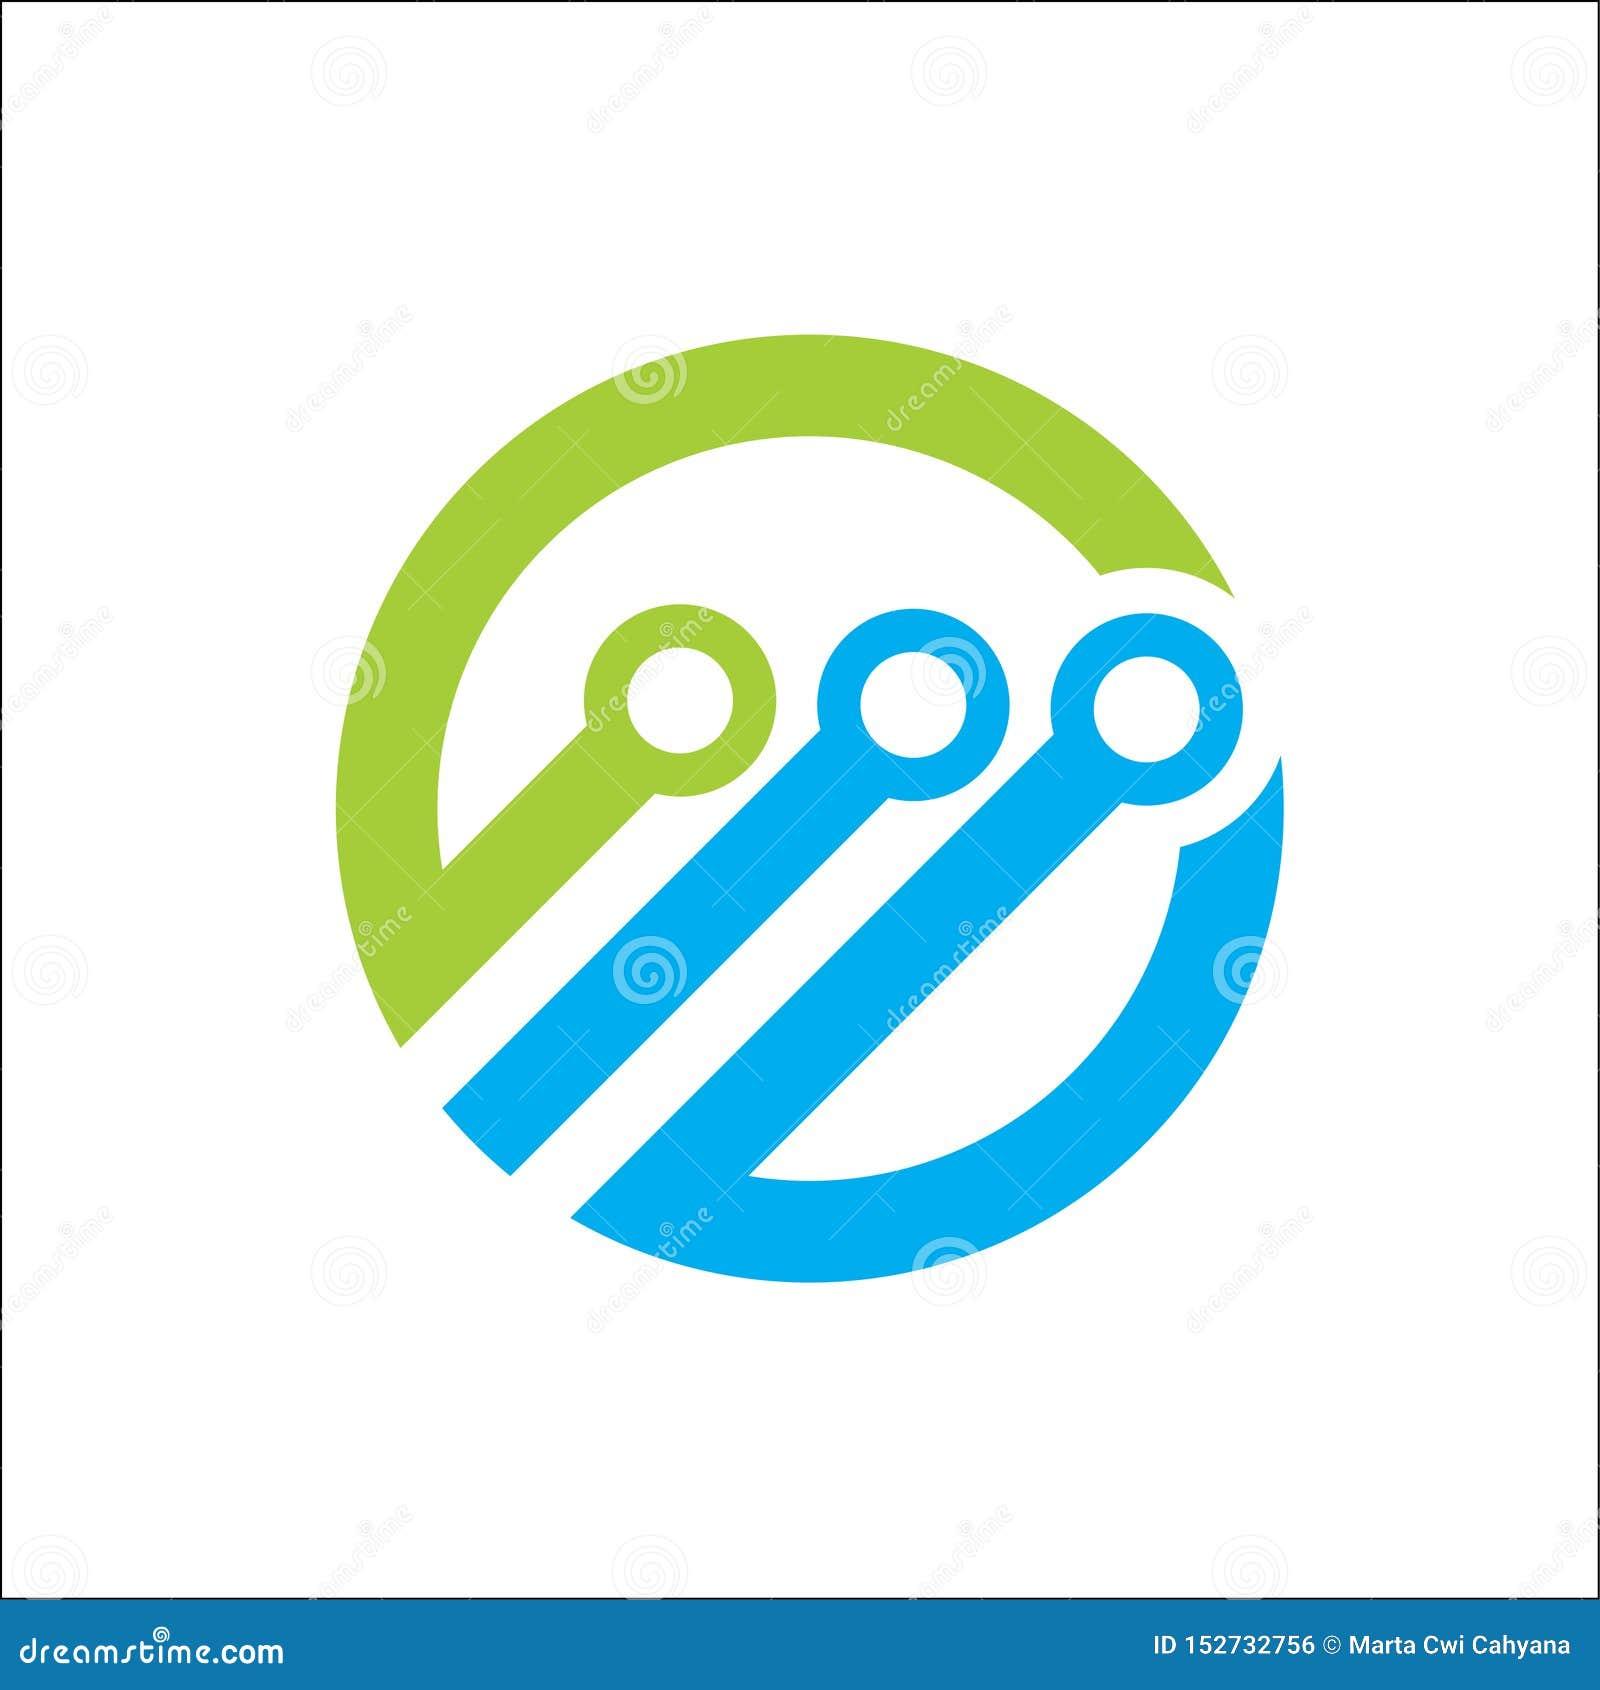 Technology abstract logo circle vector